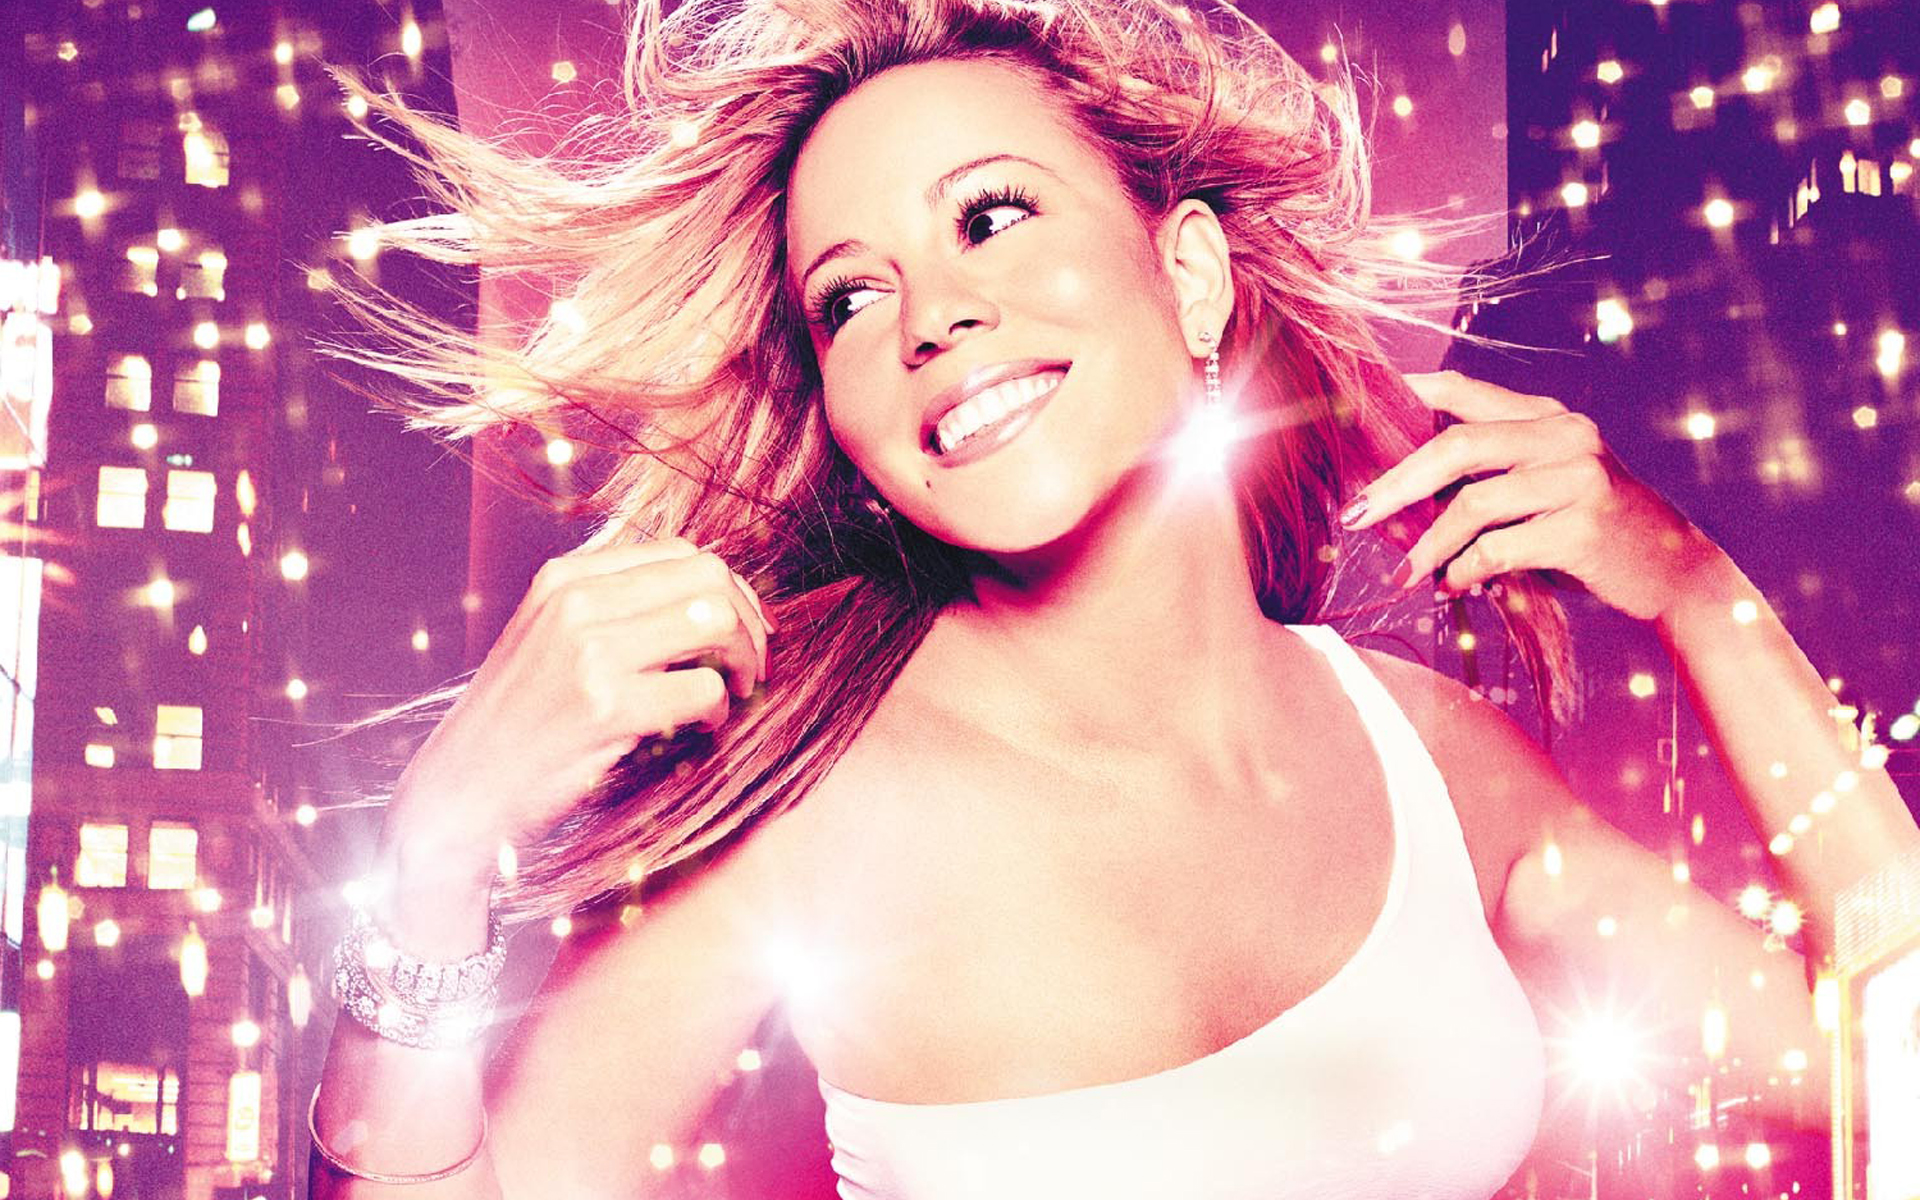 Mariah Carey Full HD Wallpaper And Background Image